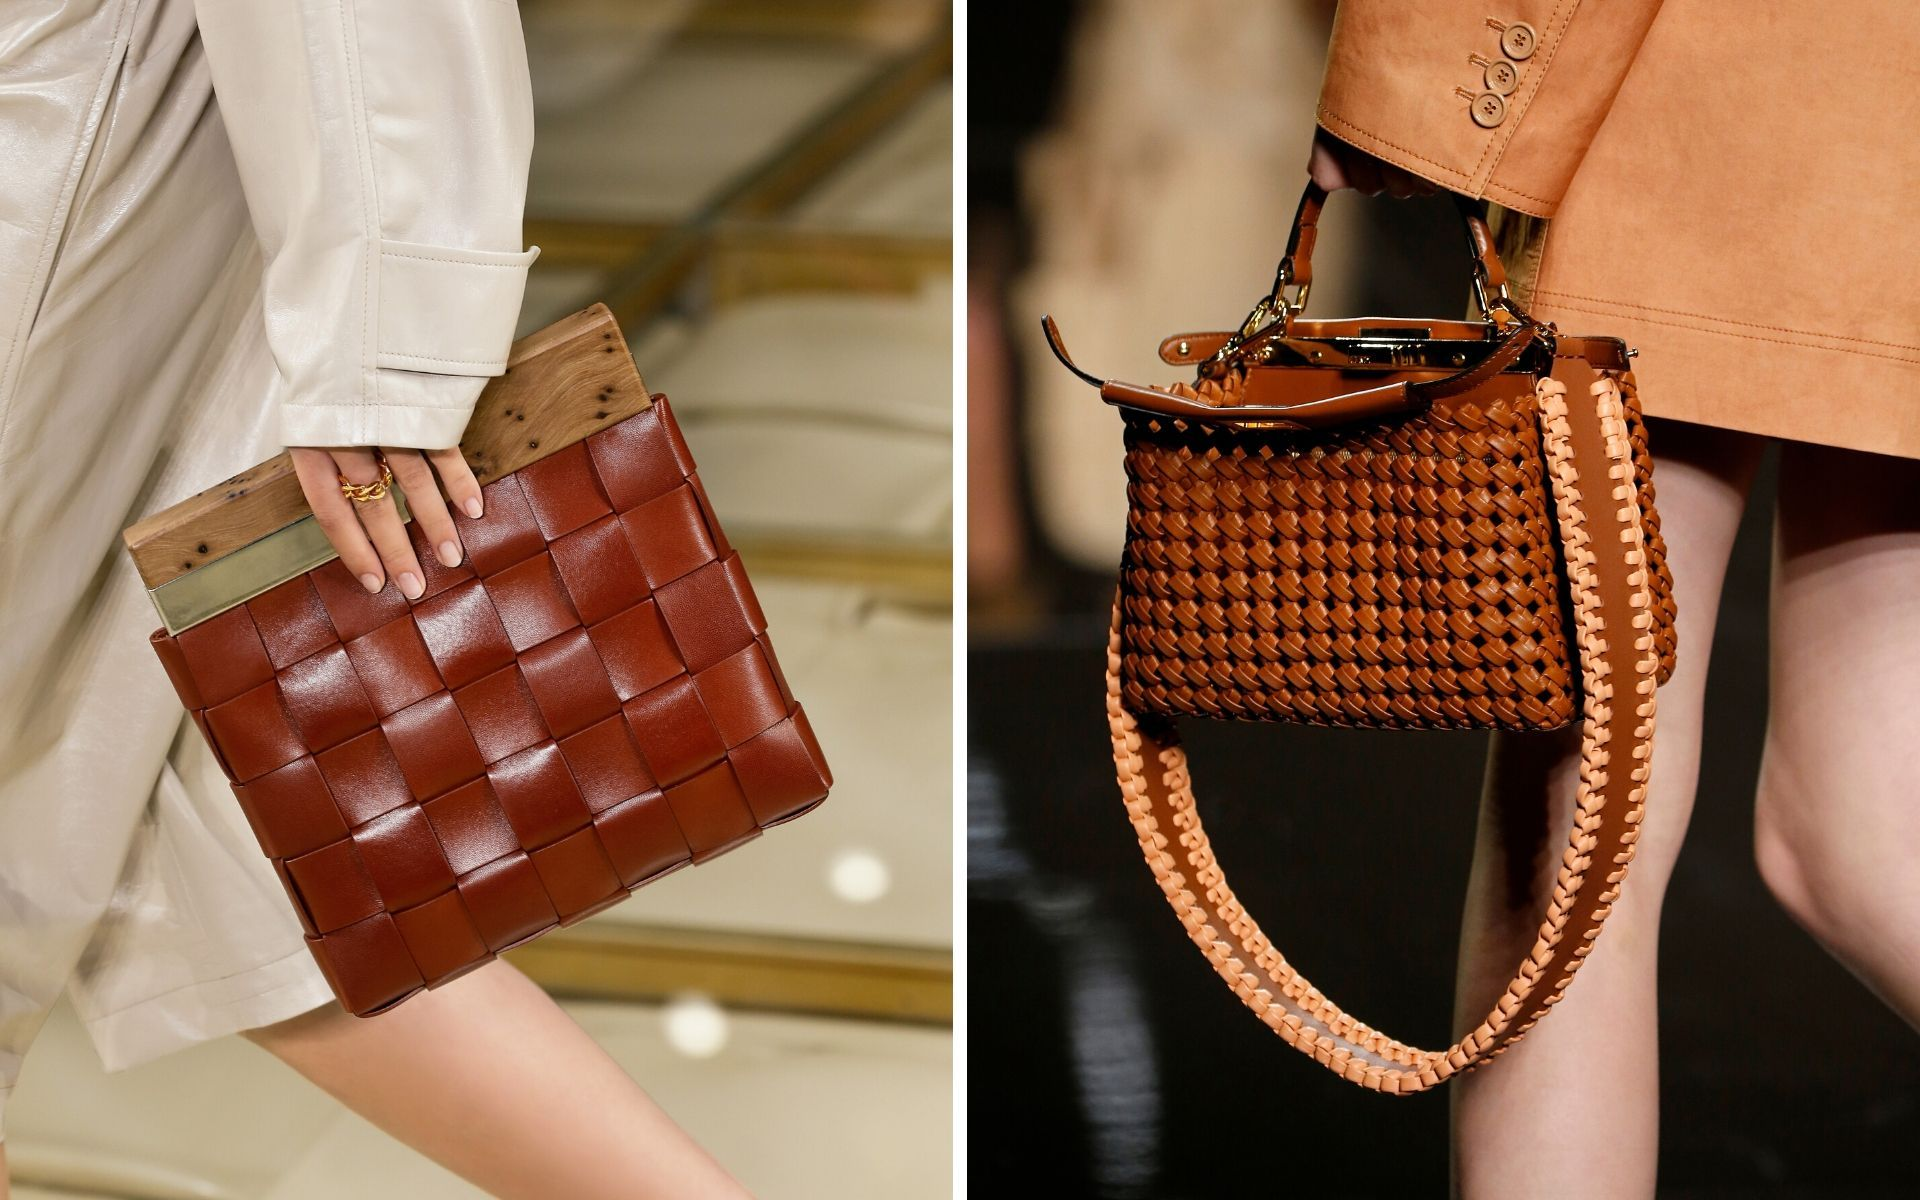 Spring Summer 2020 Celebrate The Art Of Weaving With Chanel Bottega Veneta Dior Tatler Malaysia